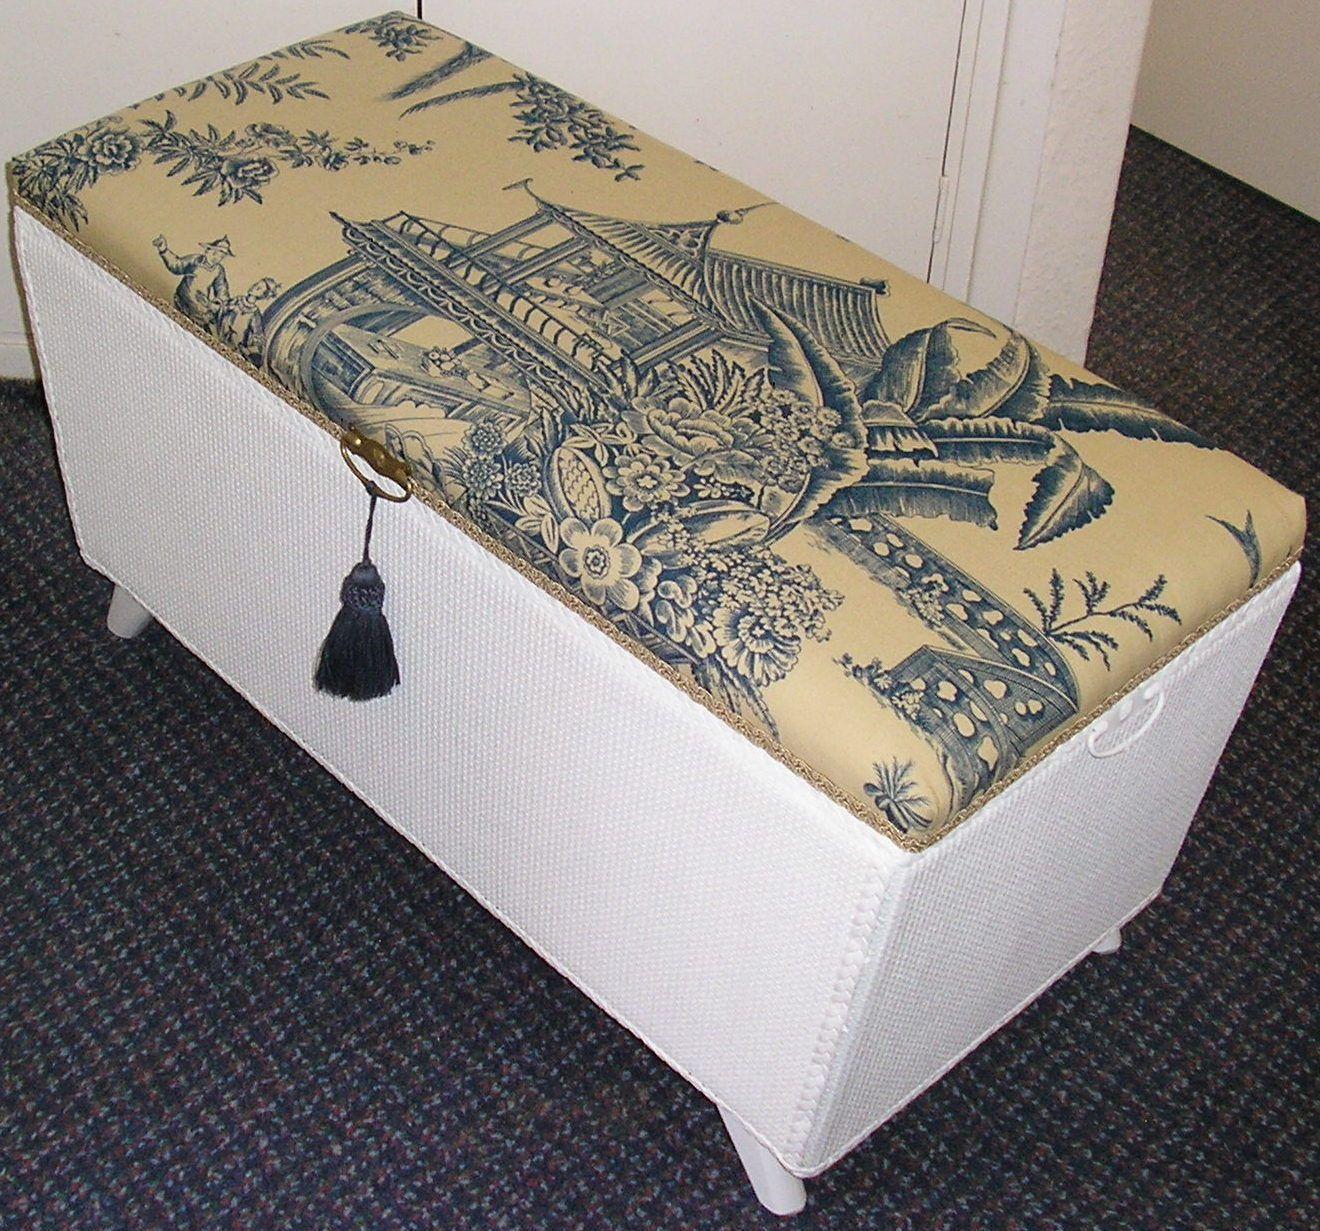 Vintage Loom Wicker Ottoman Storage Blanket Box Chest Trunk